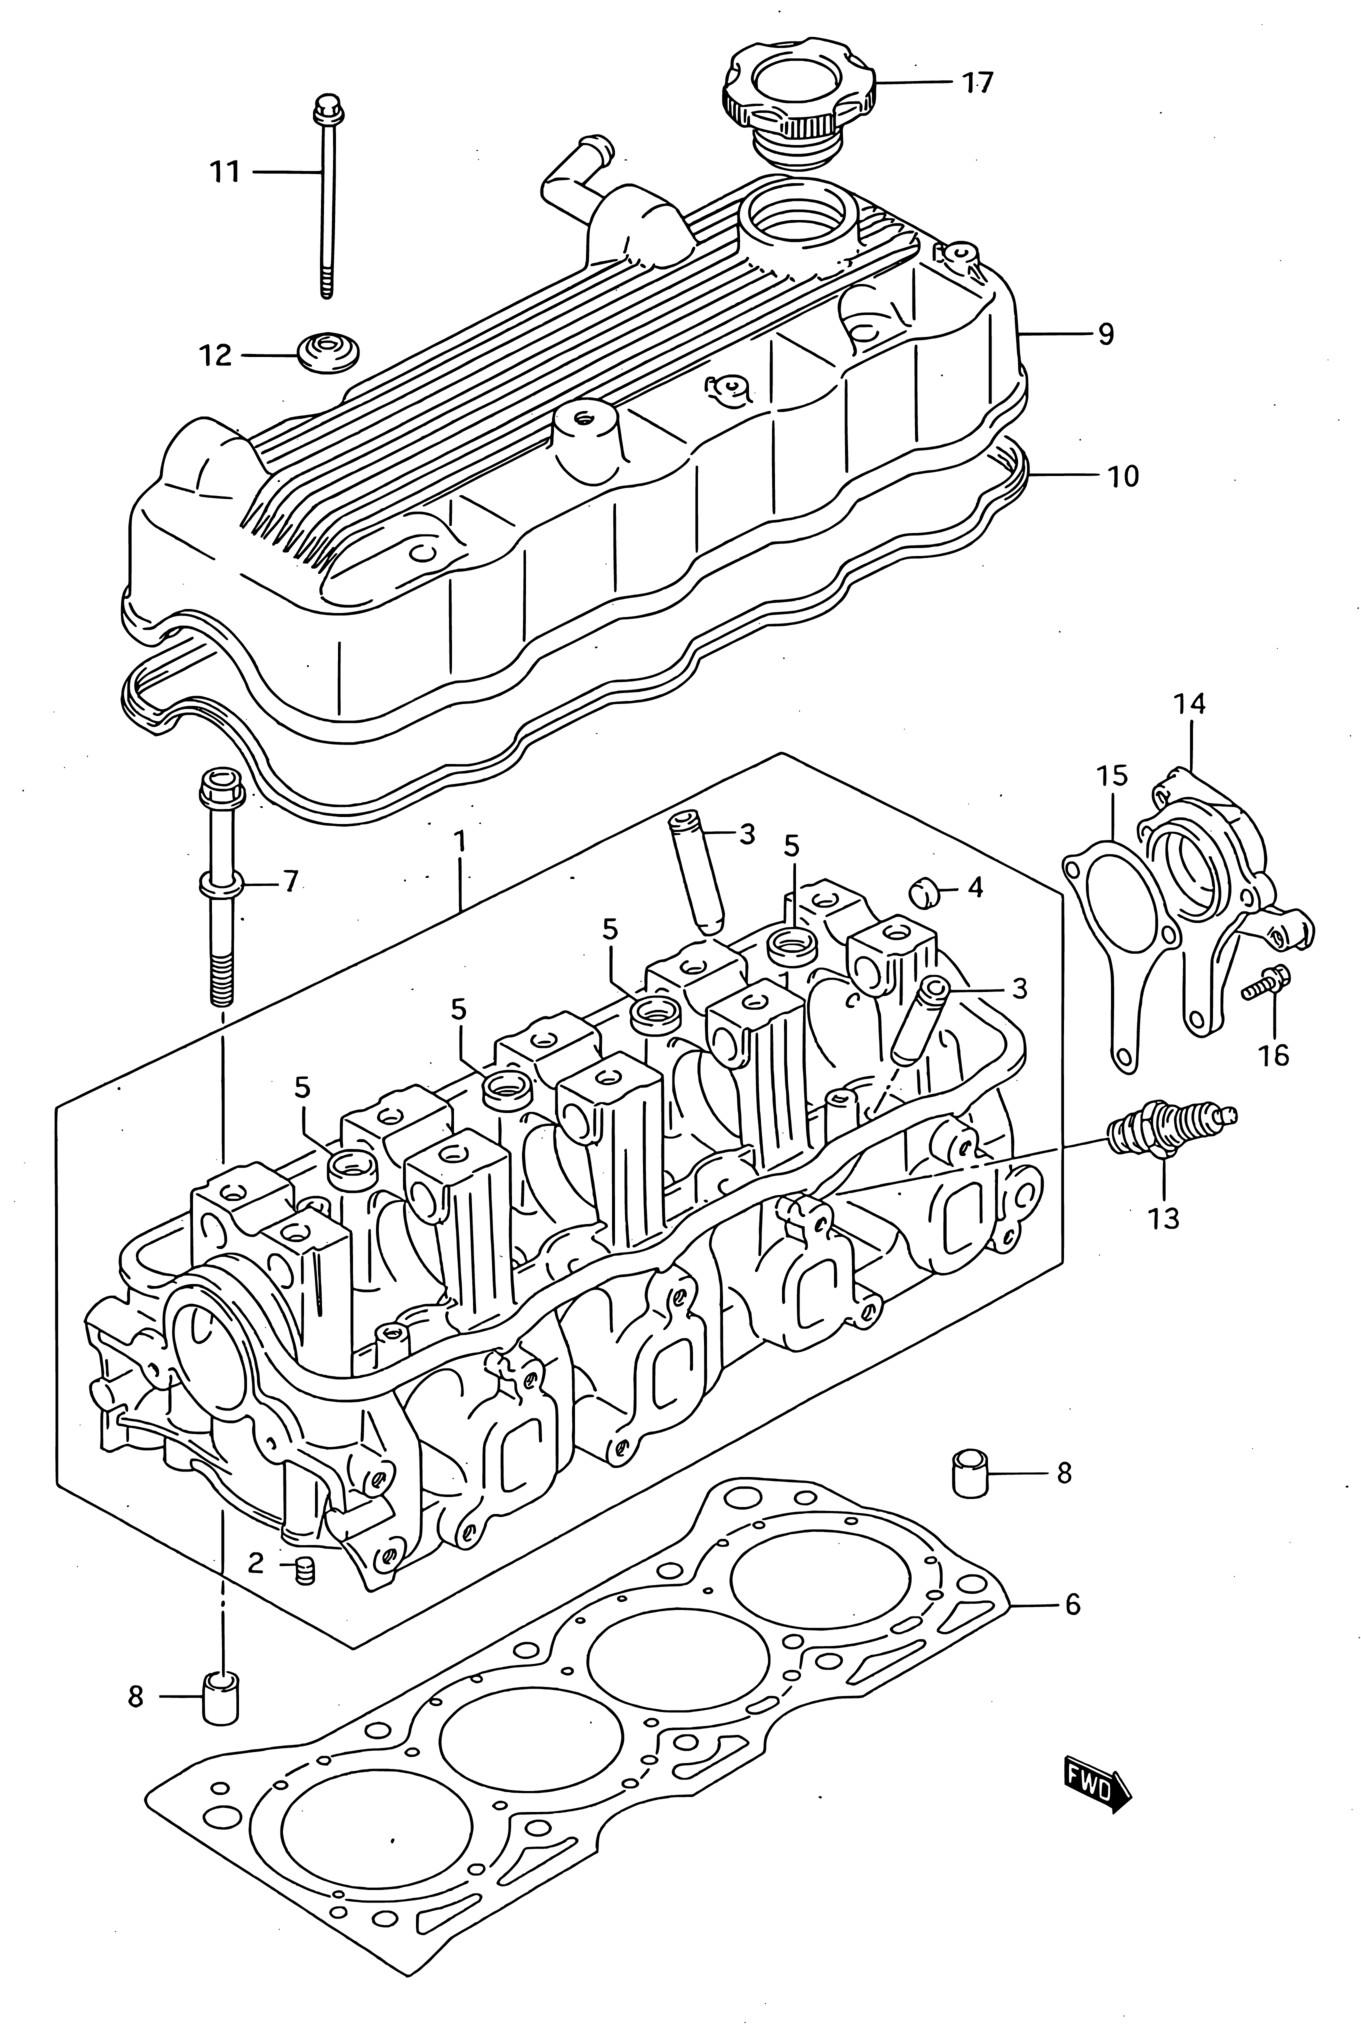 Maruti Suzuki 800 Engine Diagram asia Alto A Star Celerio 800 Sh410 Maruti E01 E02 E18 Of Maruti Suzuki 800 Engine Diagram